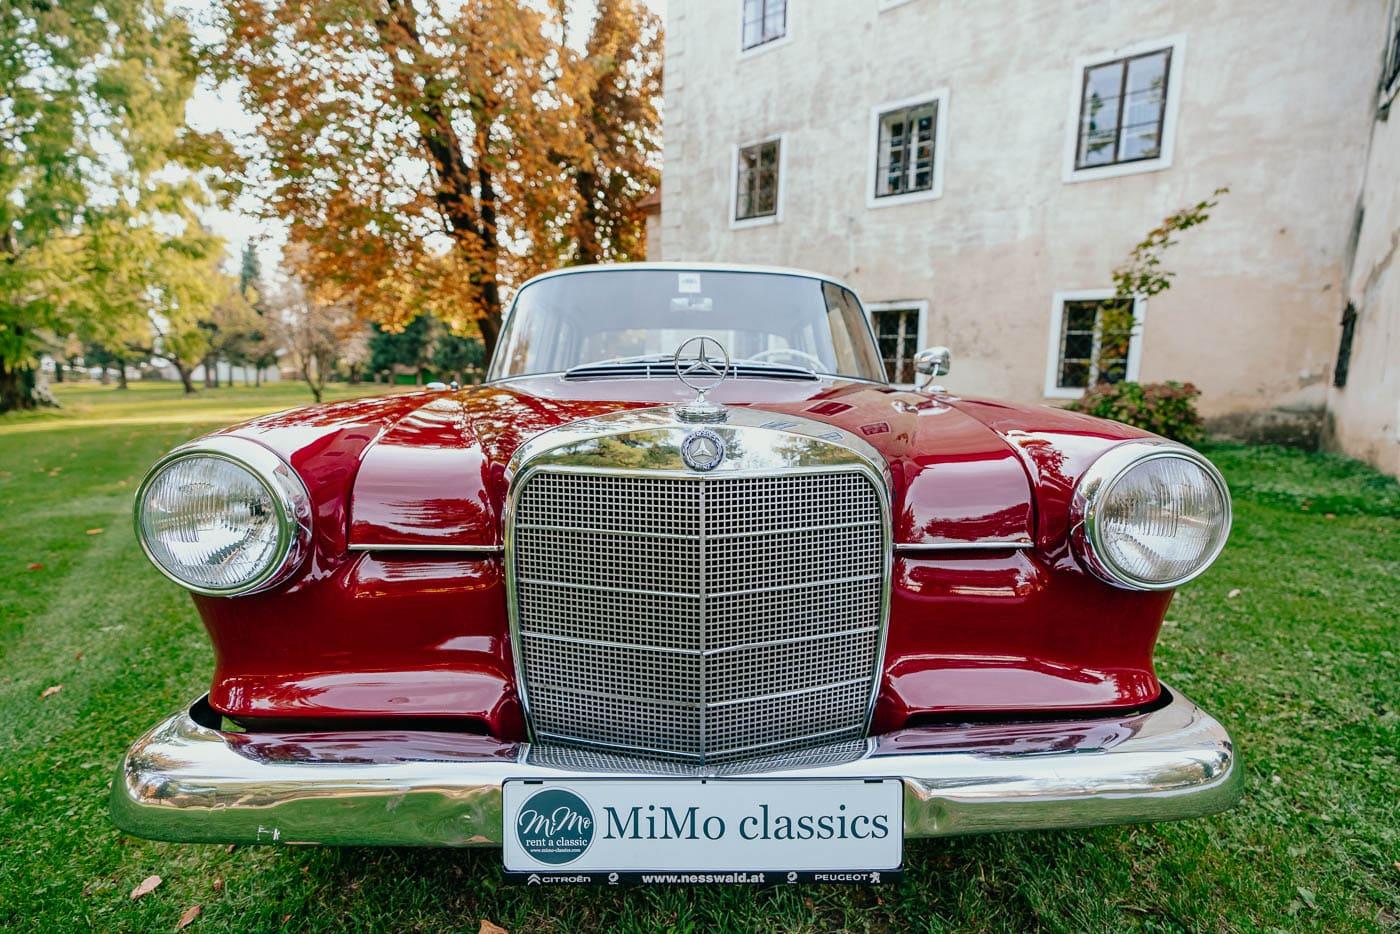 mimo-classics-oldtimervermietung-graz-mercedes-w110-heckflosse-5